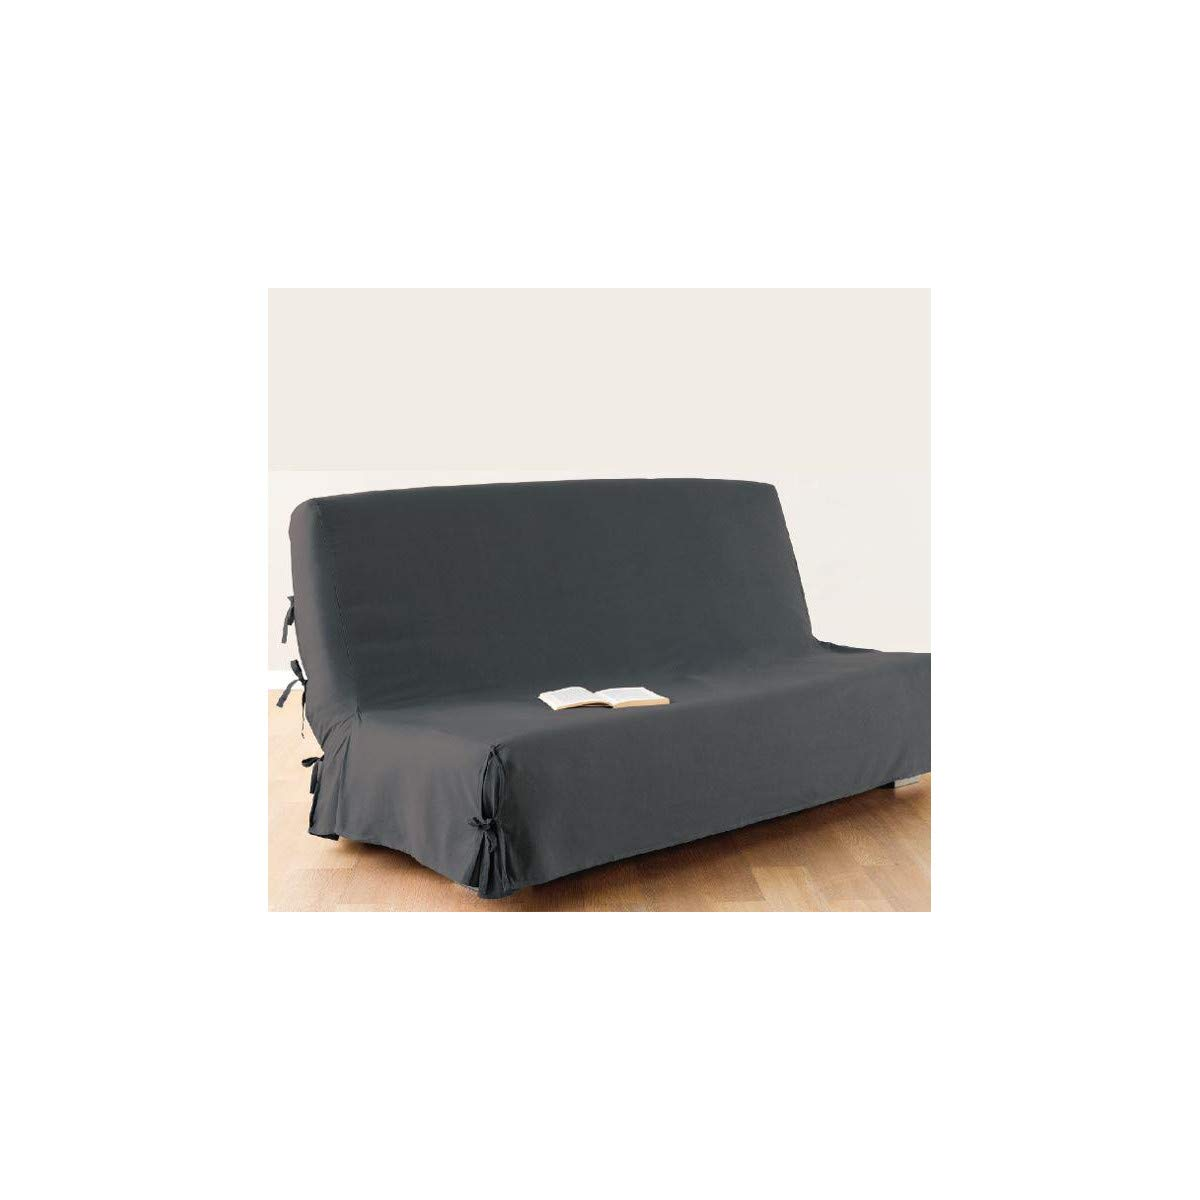 Sofa bed / Futon cover - 100 % cotton - colour DARK GREY ATMOSPHERA